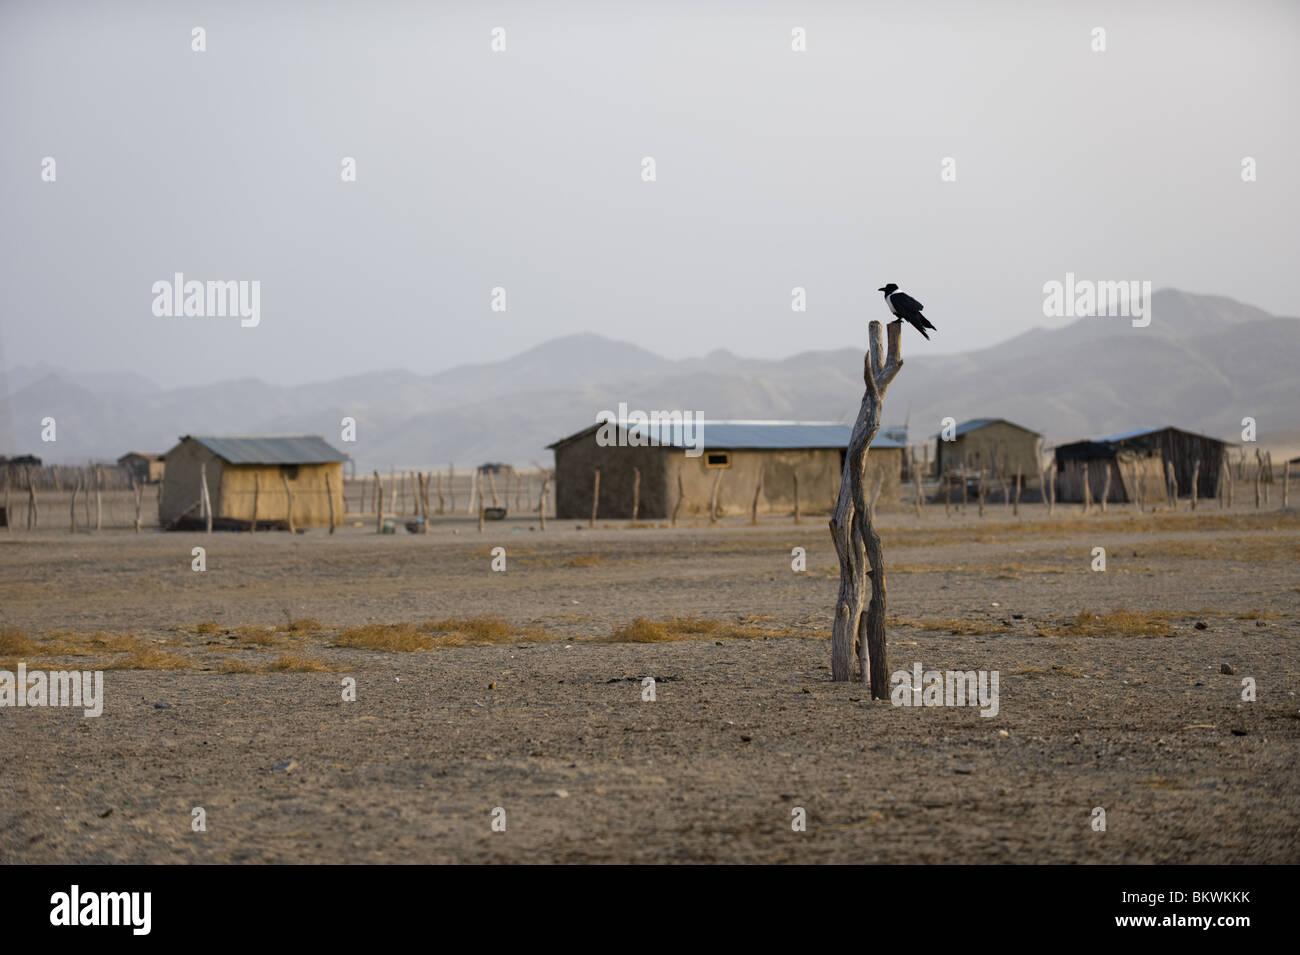 Purros Vilage, Kaokoland, Kunene Region, Namibia. Stockfoto